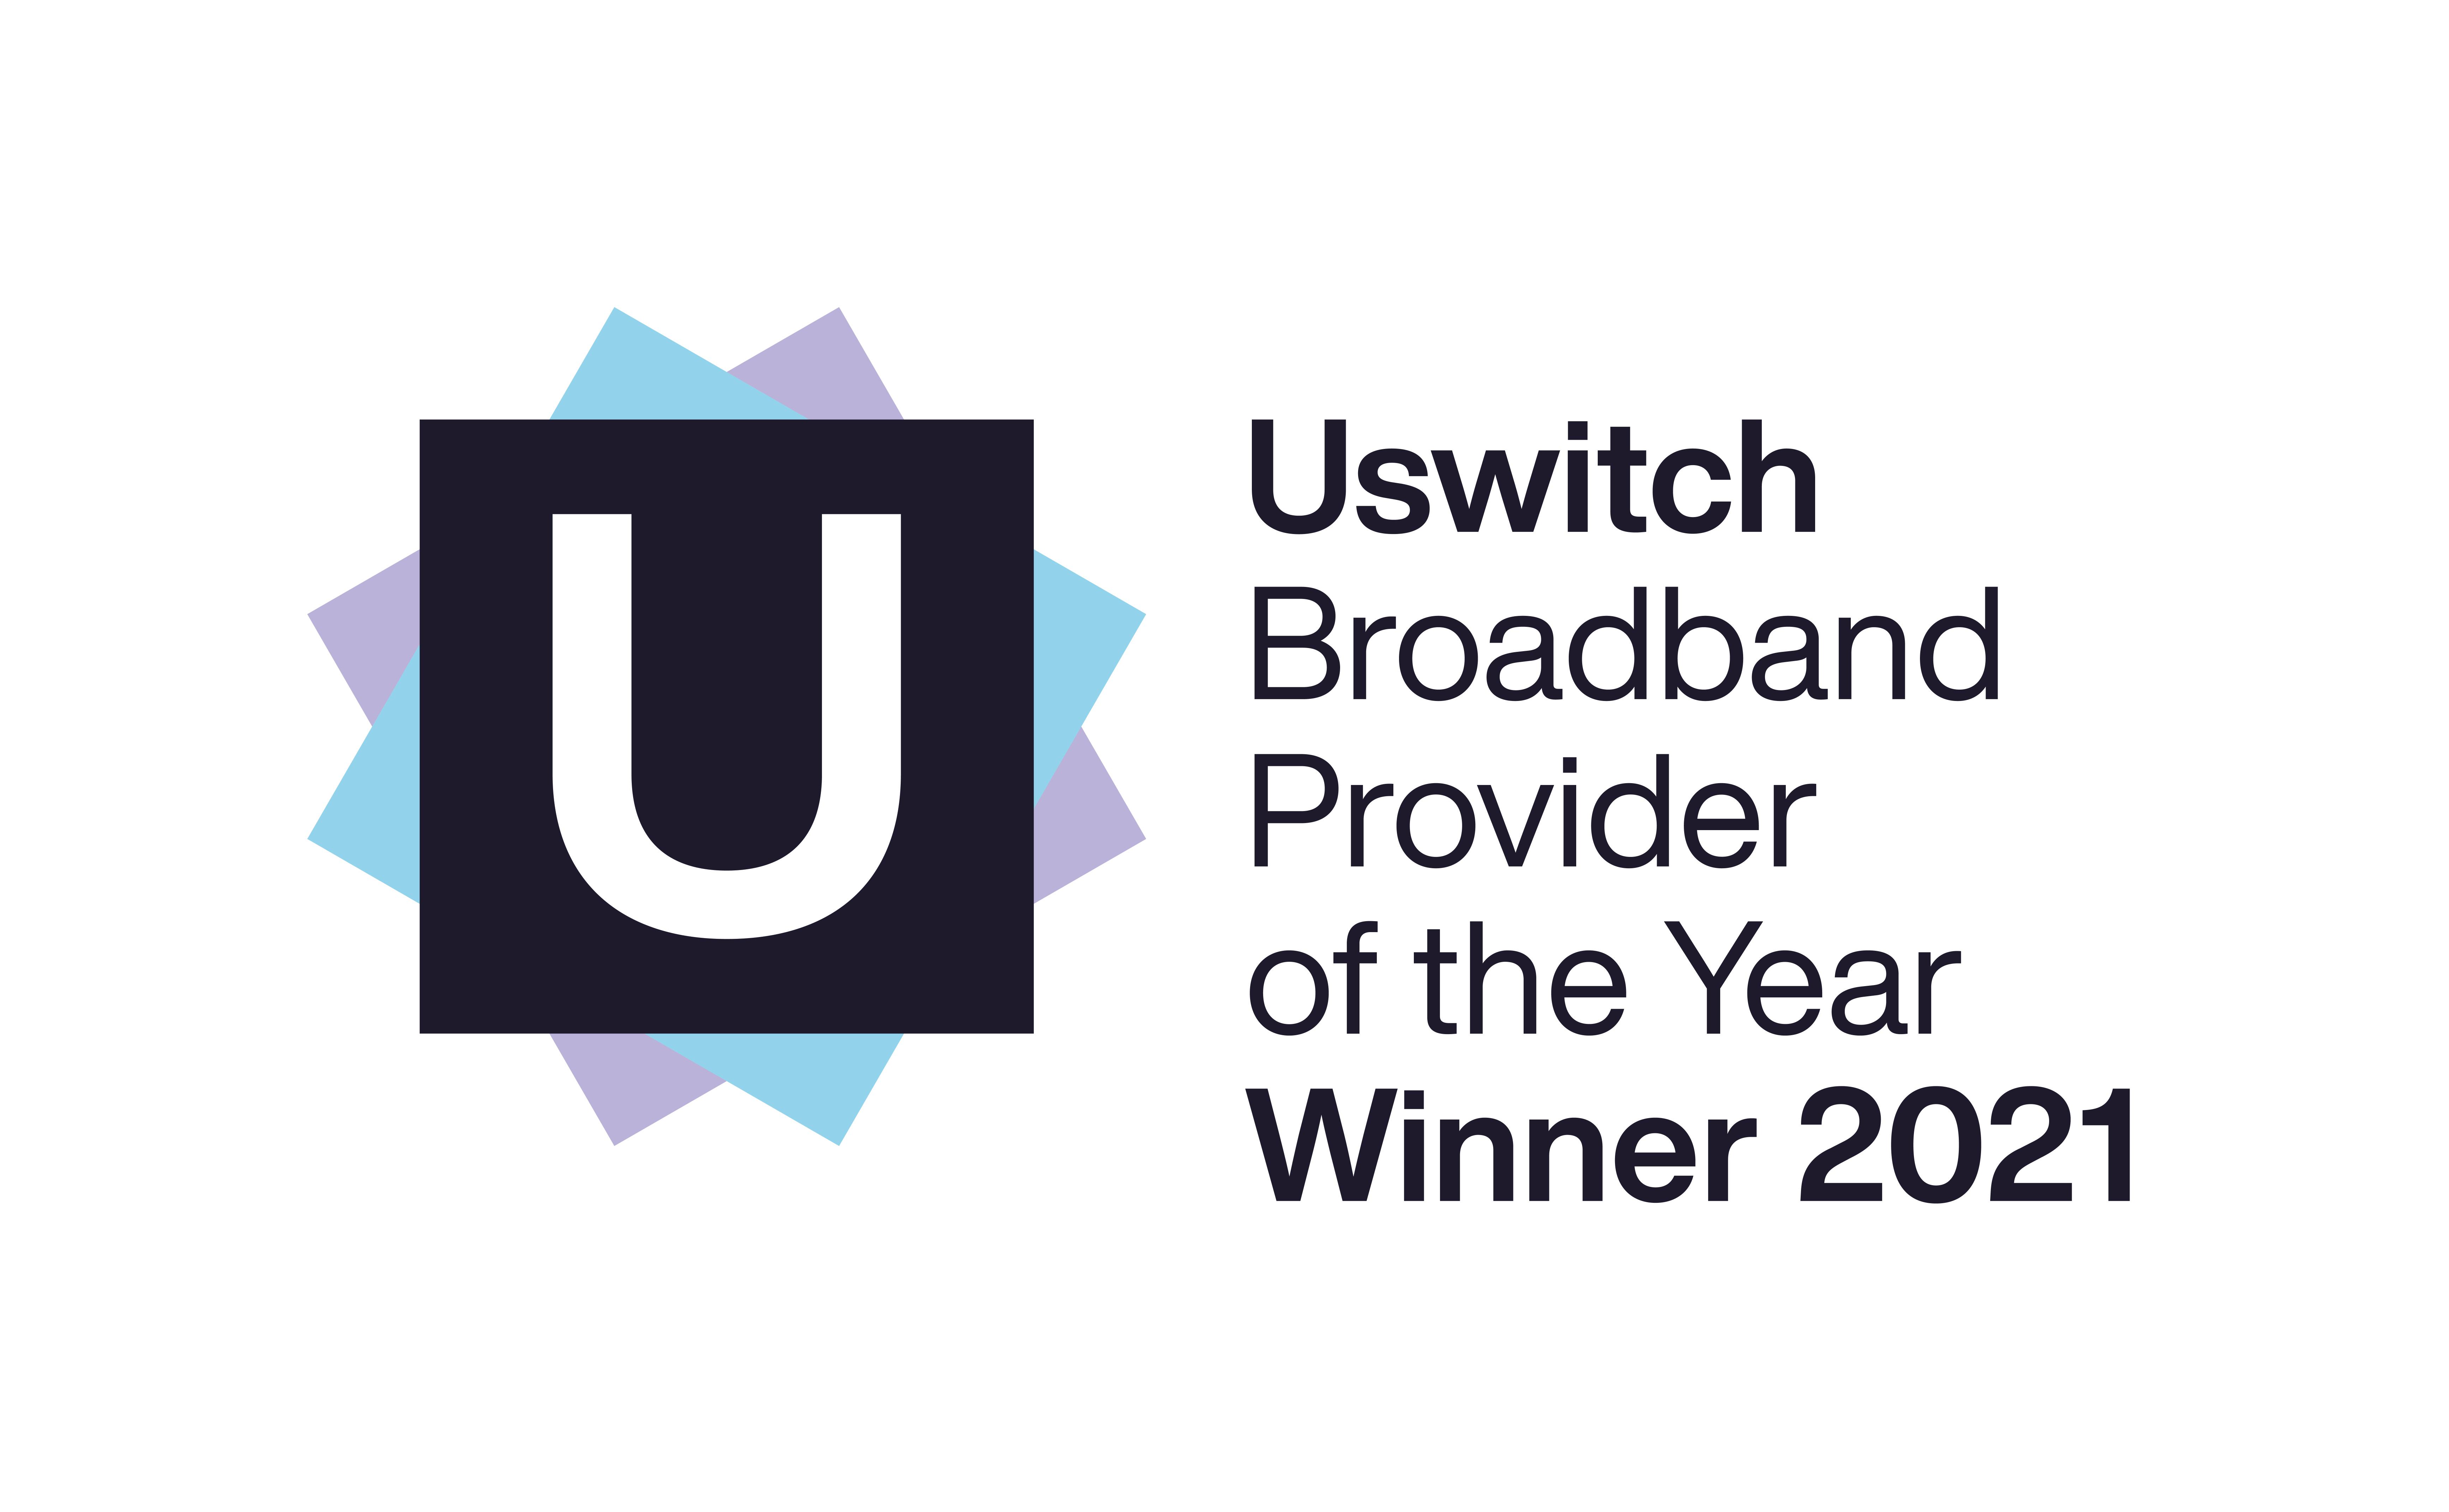 Plusnet Uswitch Broadband Provider Of The Year